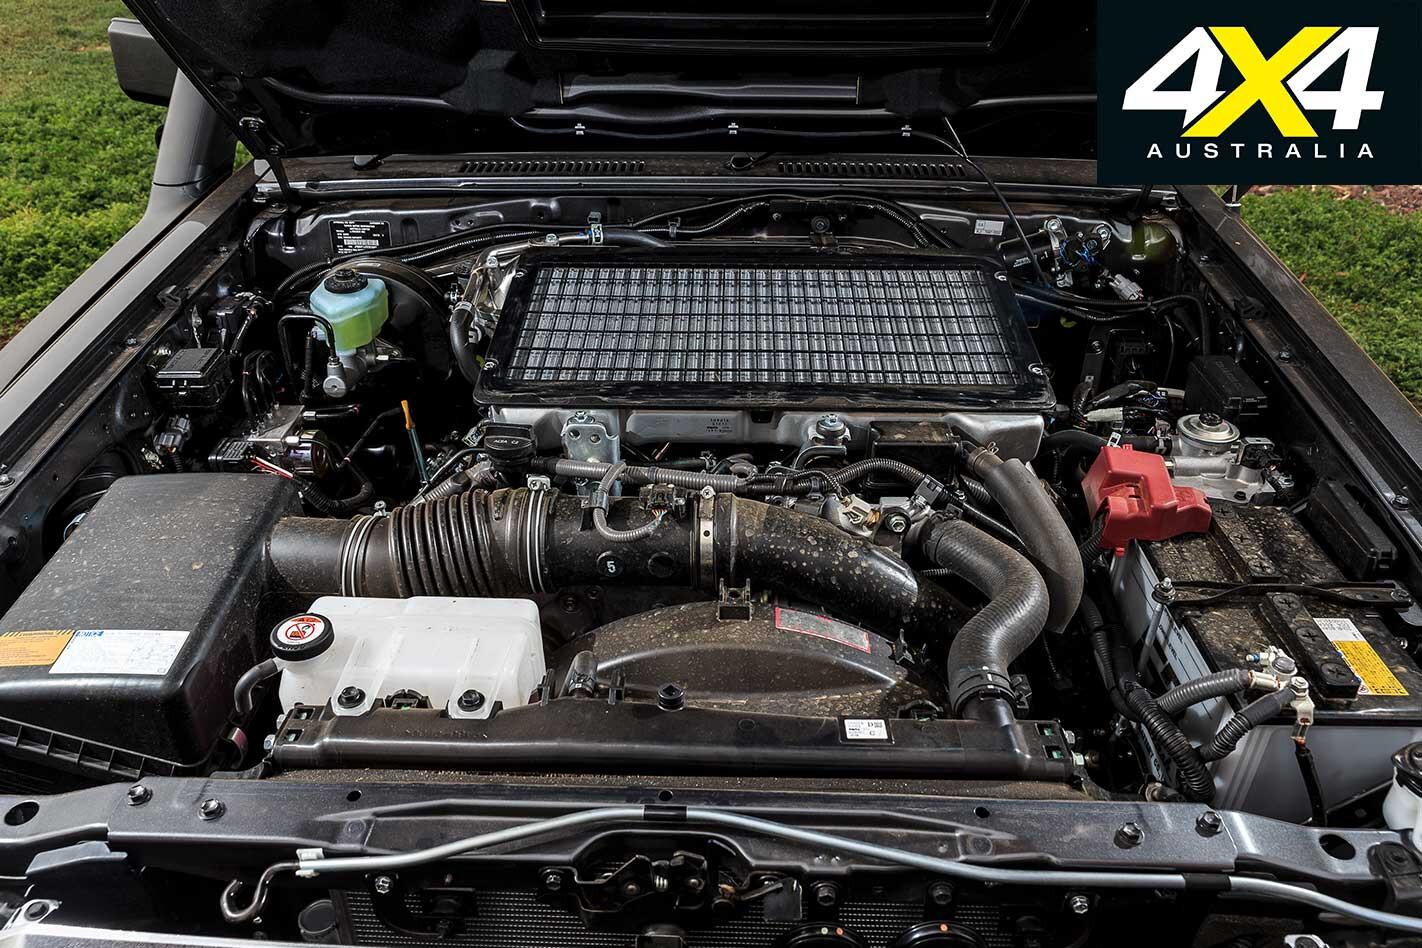 Toyota Land Cruiser 79 Series Engine Jpg